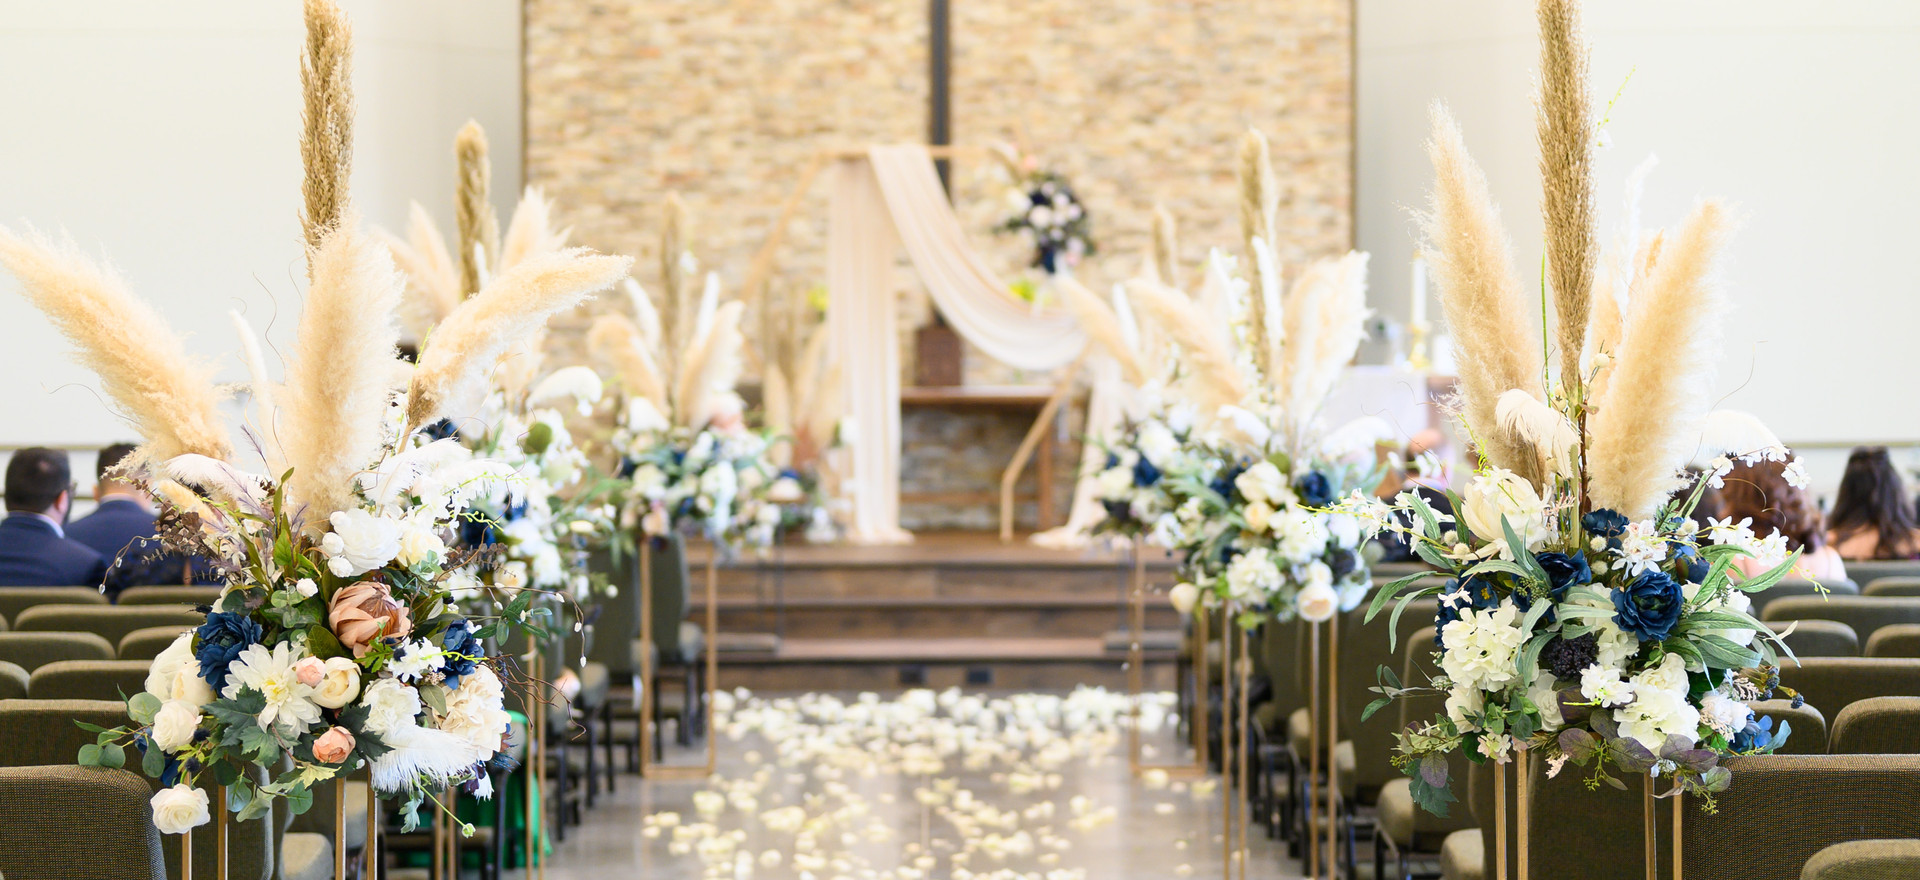 036_Lorena and Mike's Wedding day.jpg